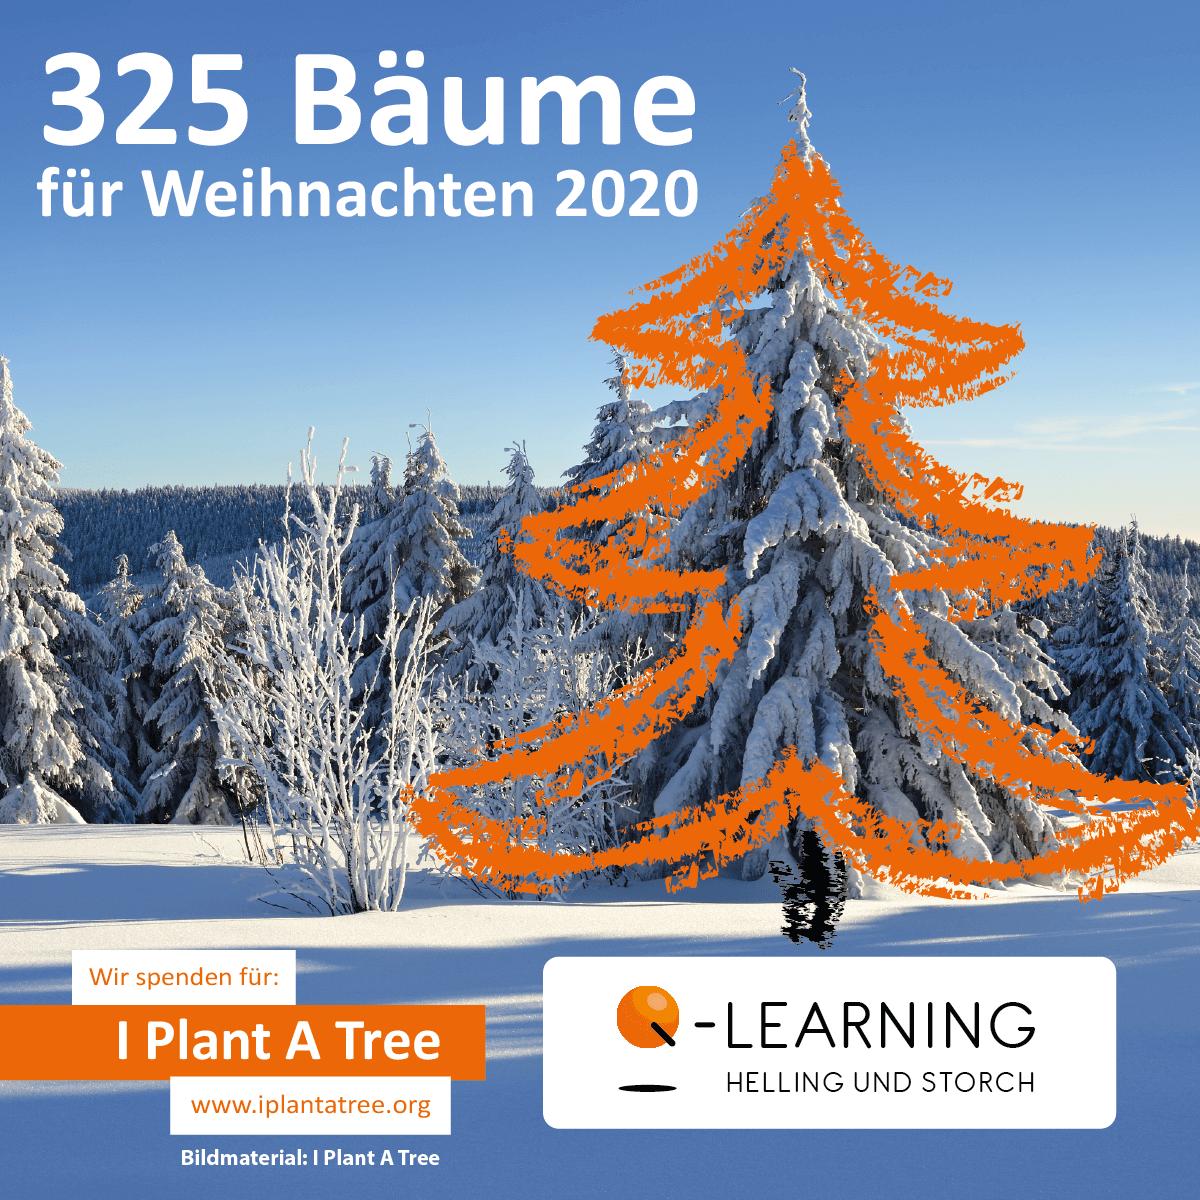 Q-LEARNING | I Plant A Tree Projekt Weihnachten 2020